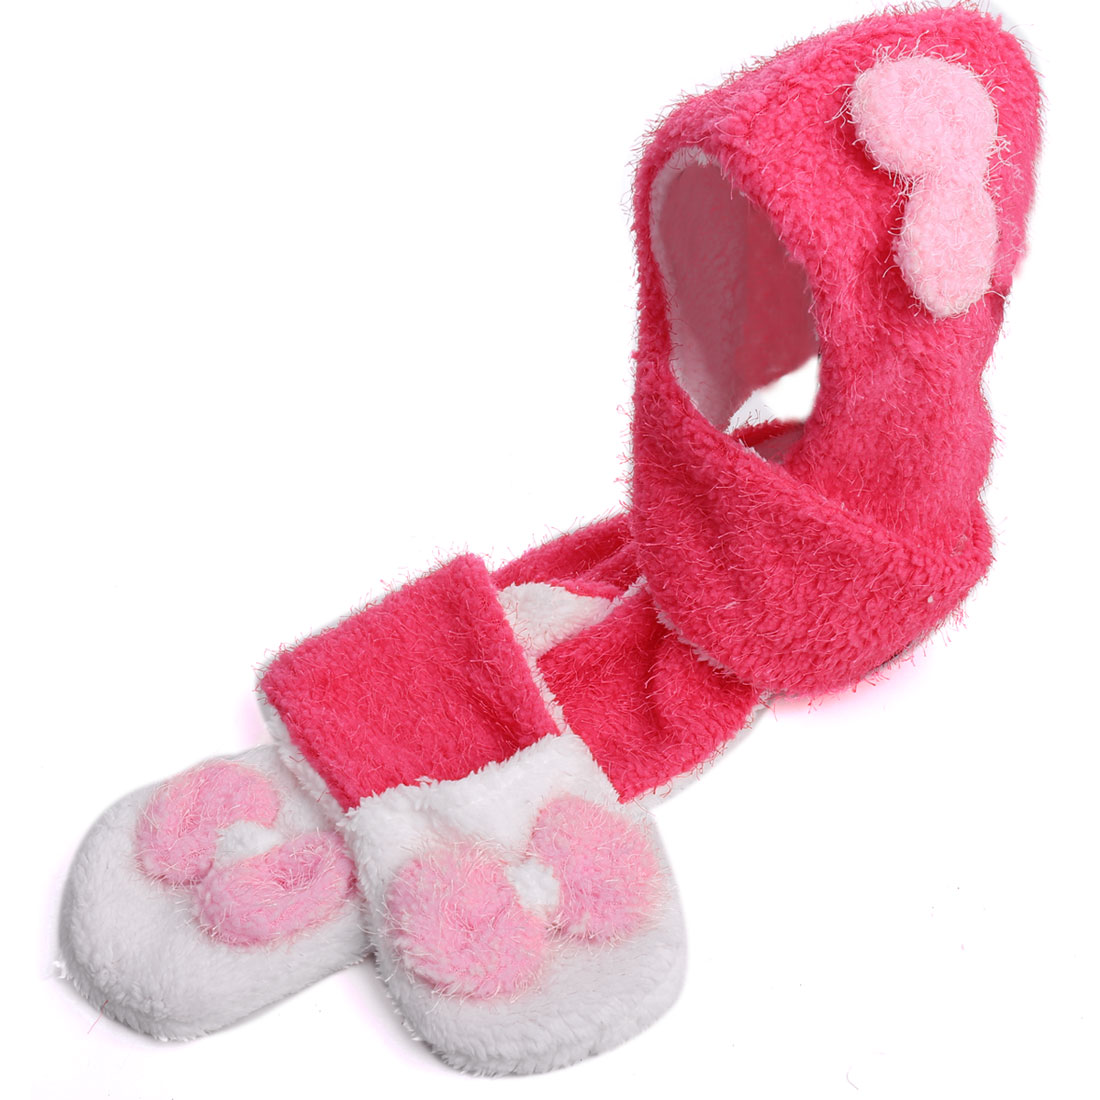 Tasharina Girl's Bowknot Decor Gloves Winter Wearing Scarf Pink White